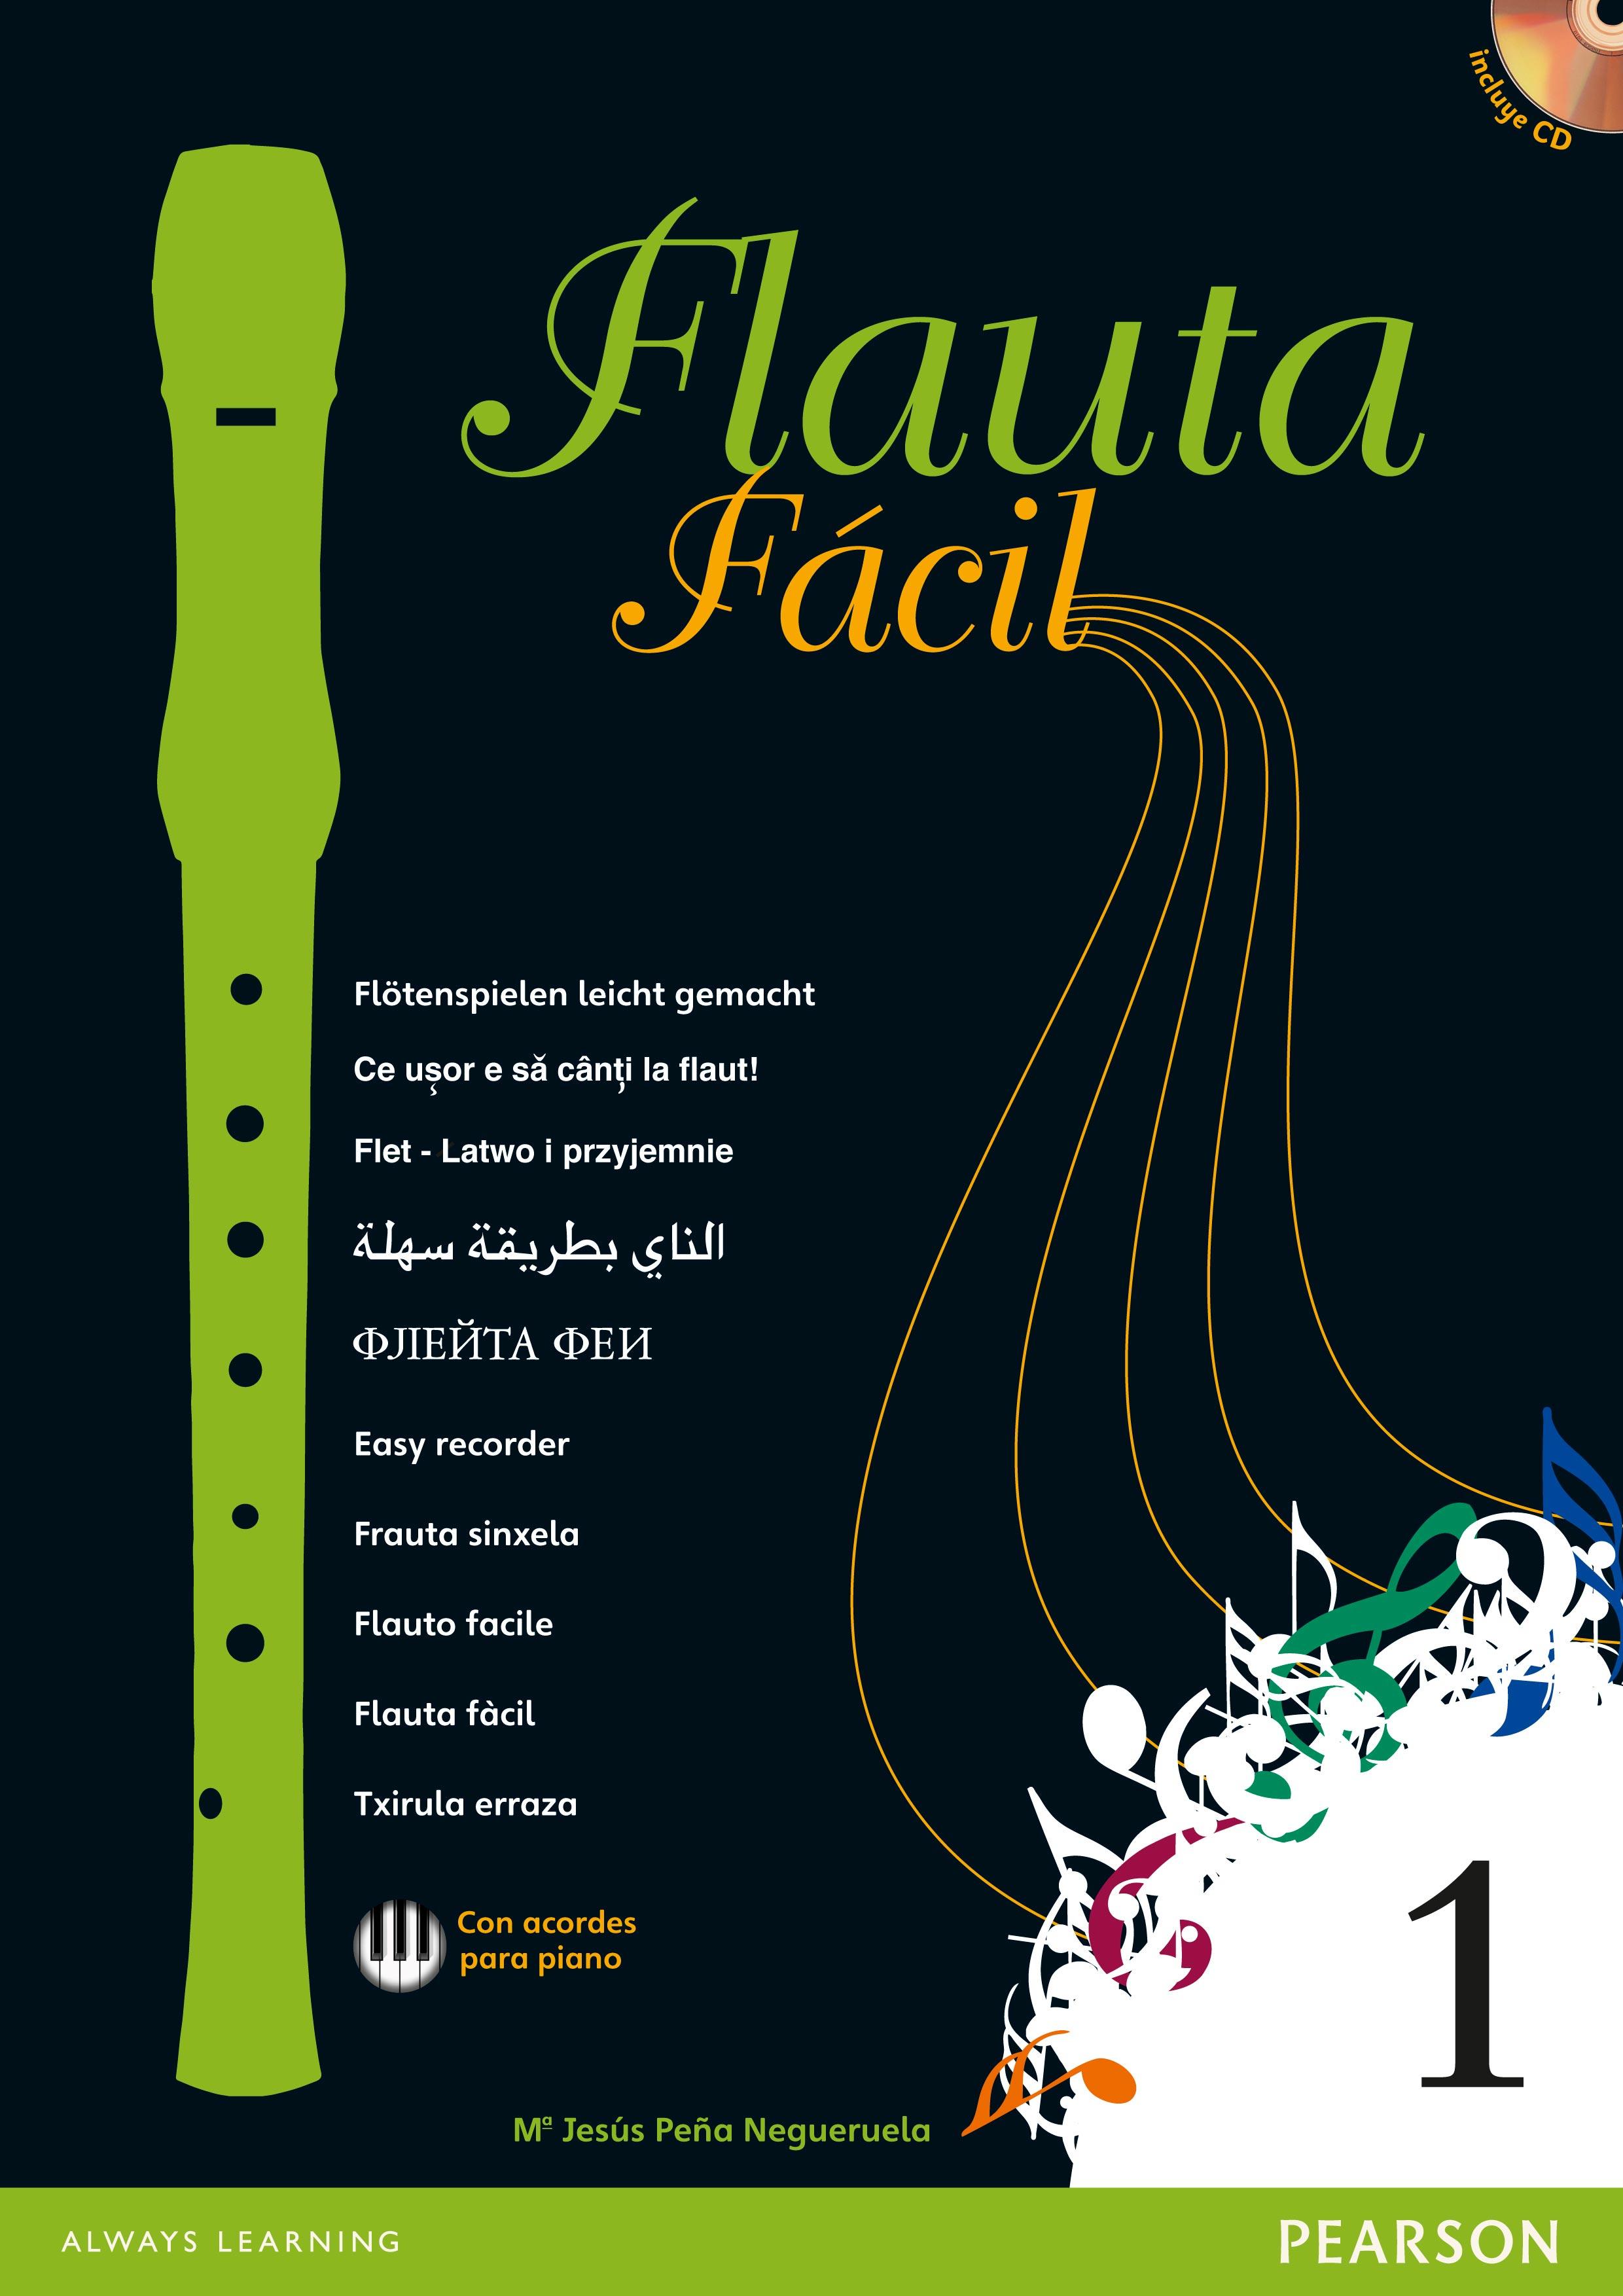 flauta fácil 1 pack con flauta yamaha-9788420561561